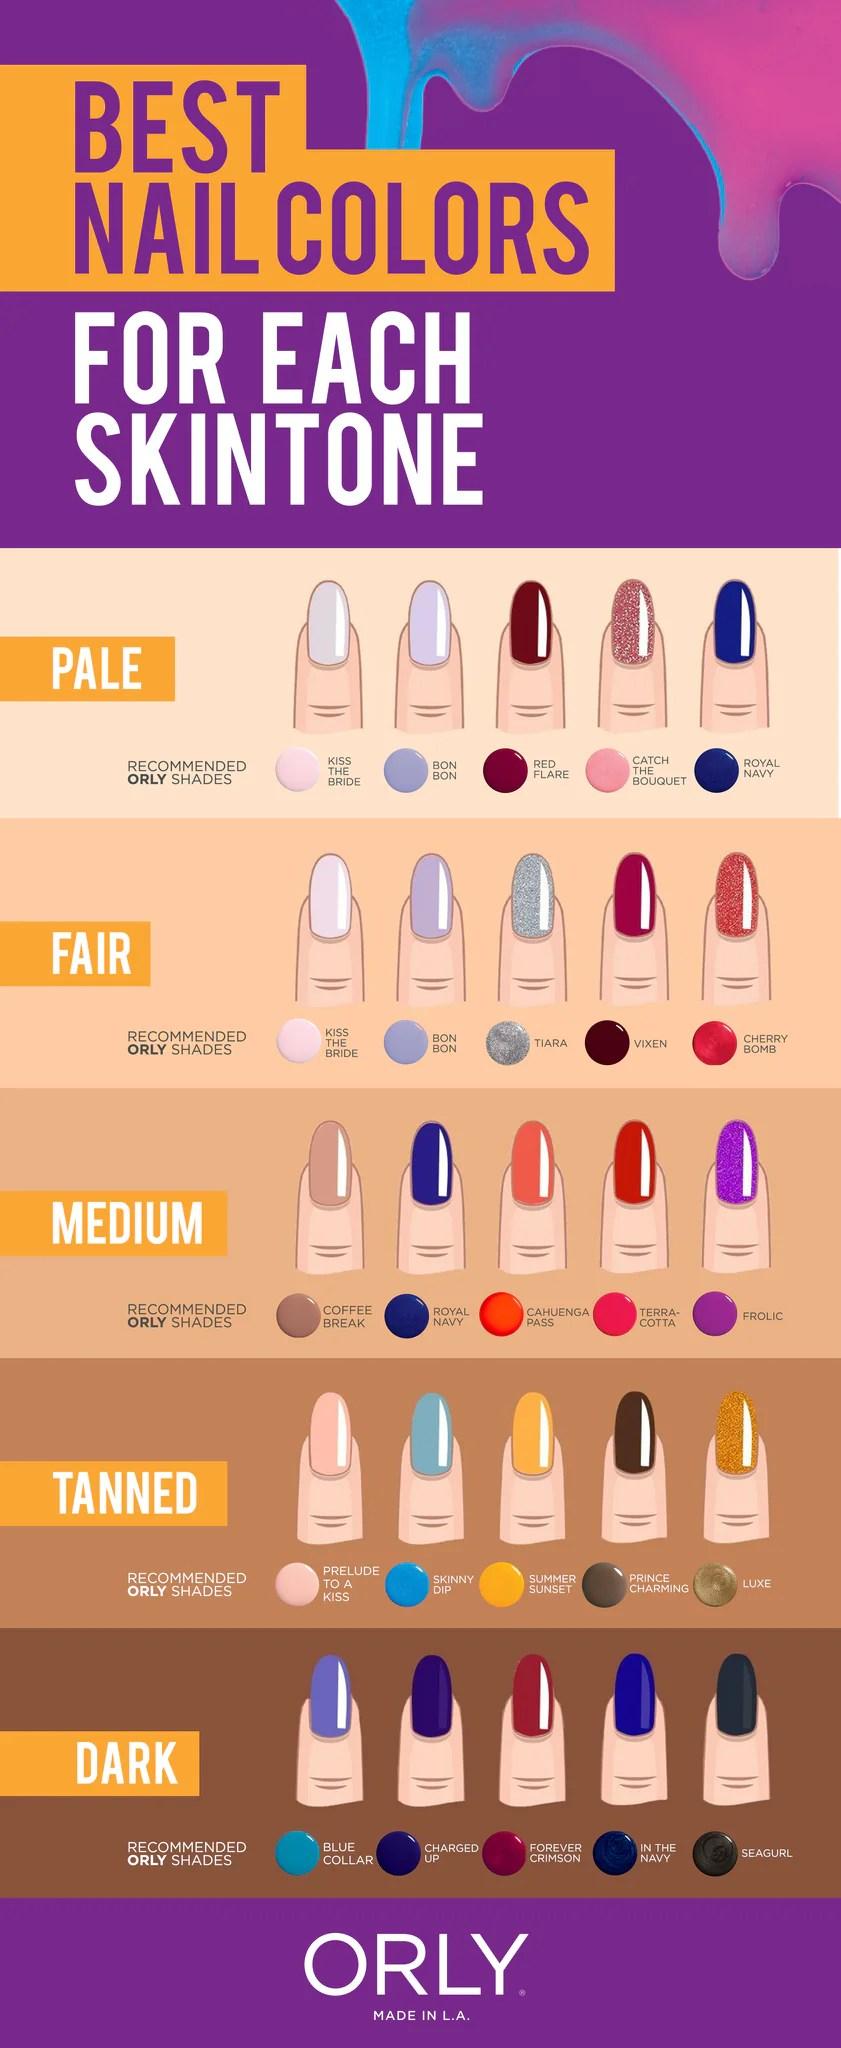 Best Nail Colors For Pale Skin : colors, Colors, Shoppurebeauty